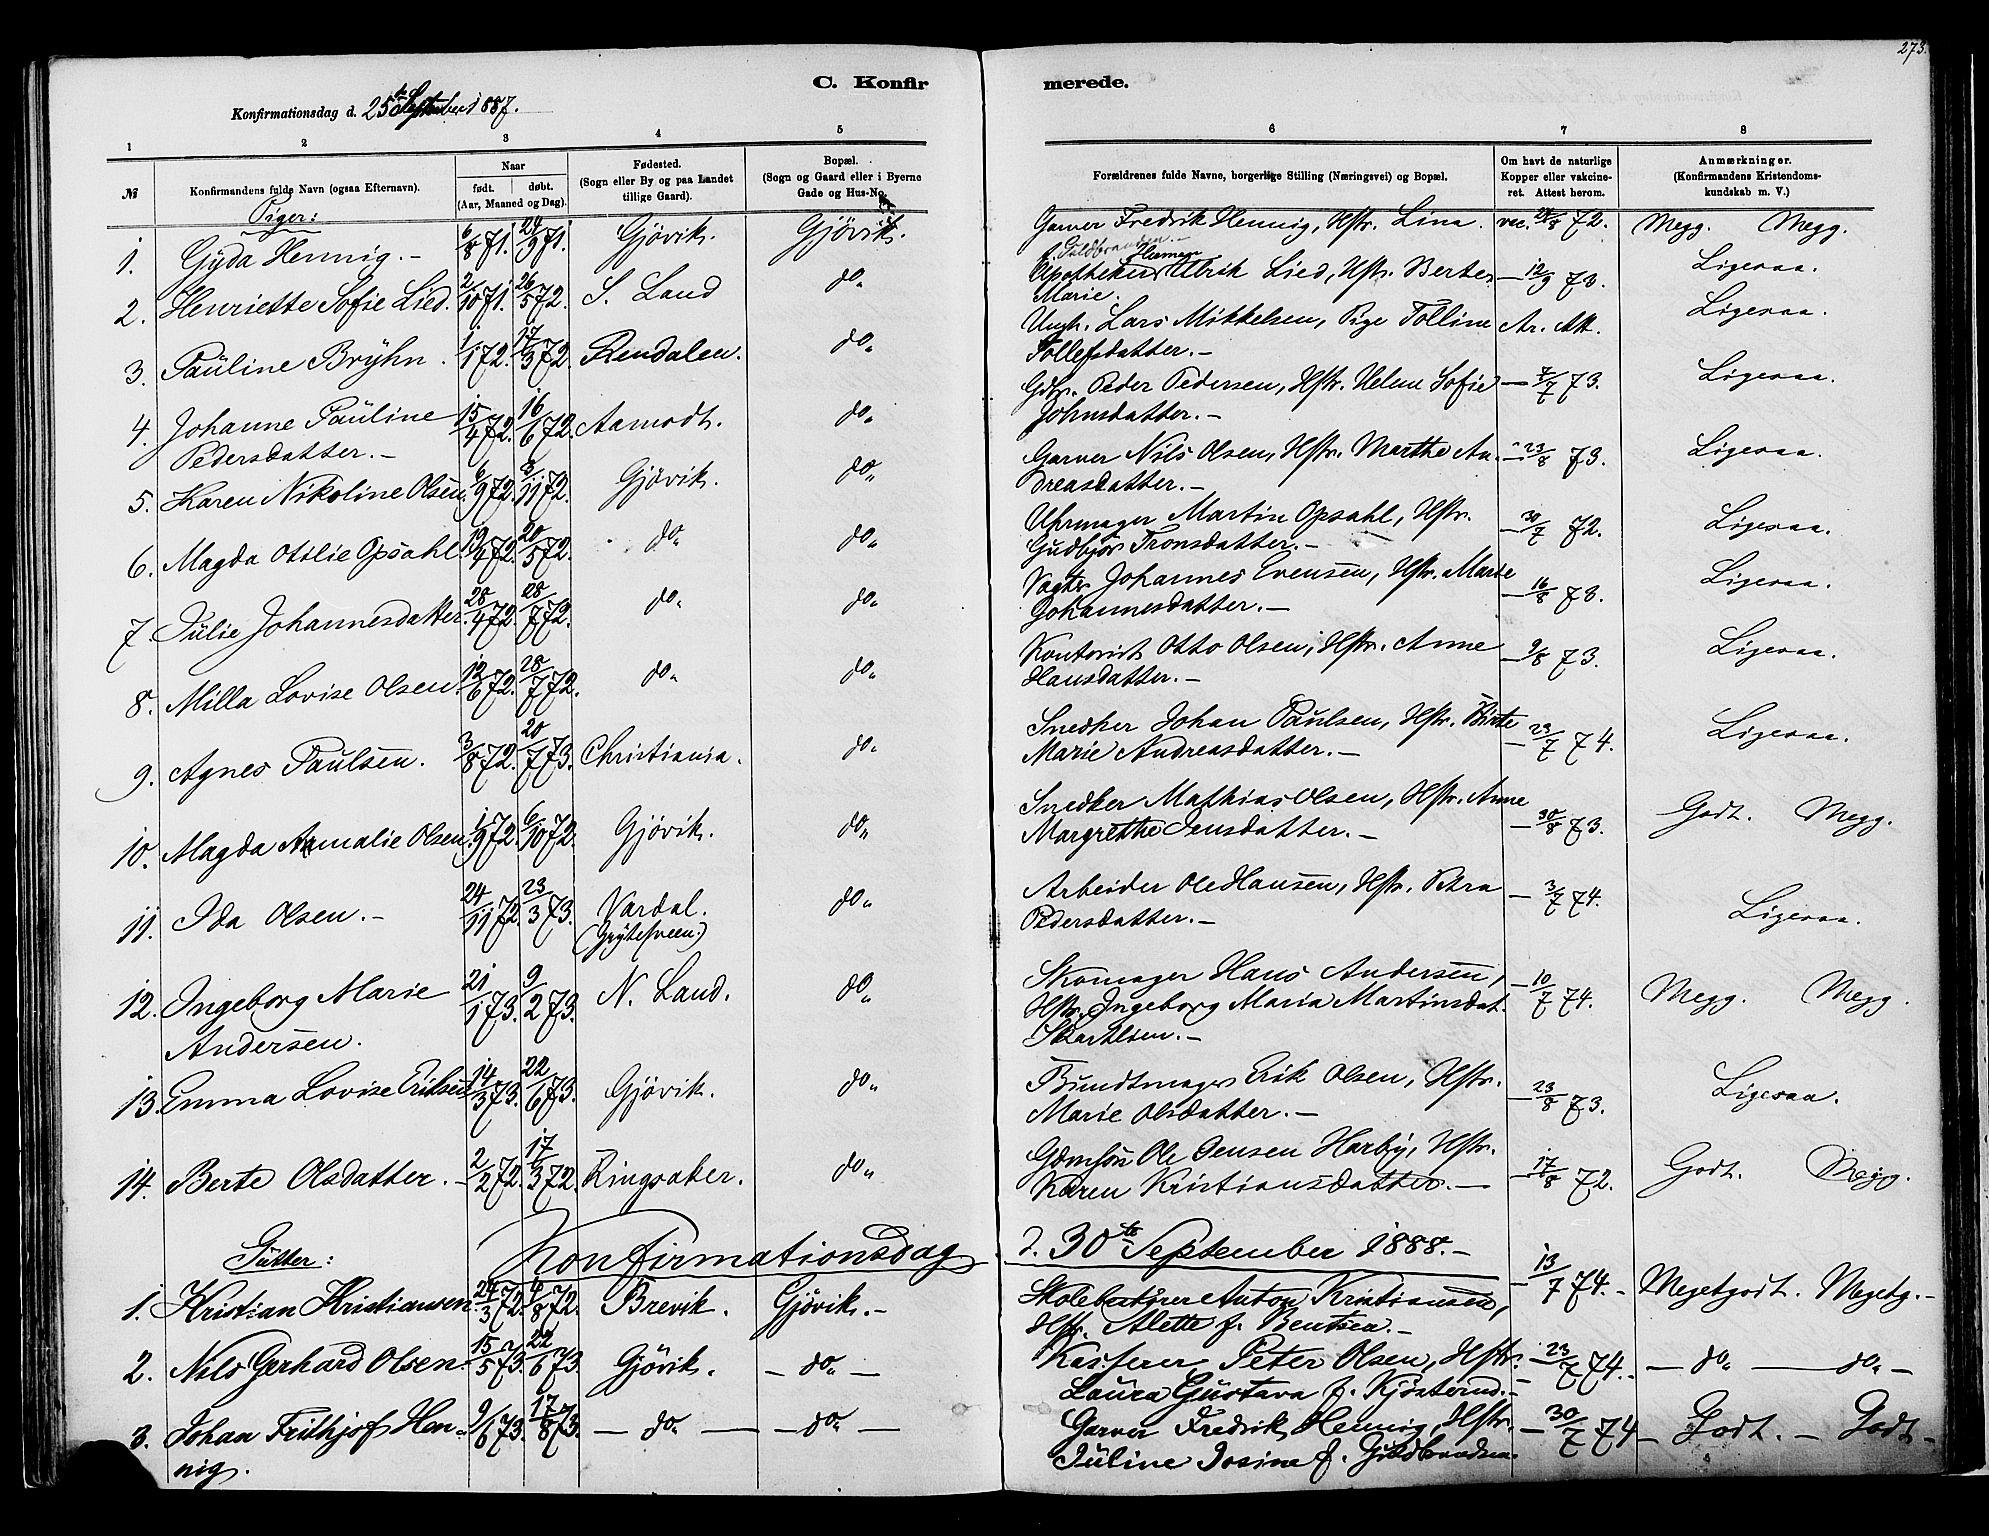 SAH, Vardal prestekontor, H/Ha/Haa/L0008: Ministerialbok nr. 8, 1878-1890, s. 273